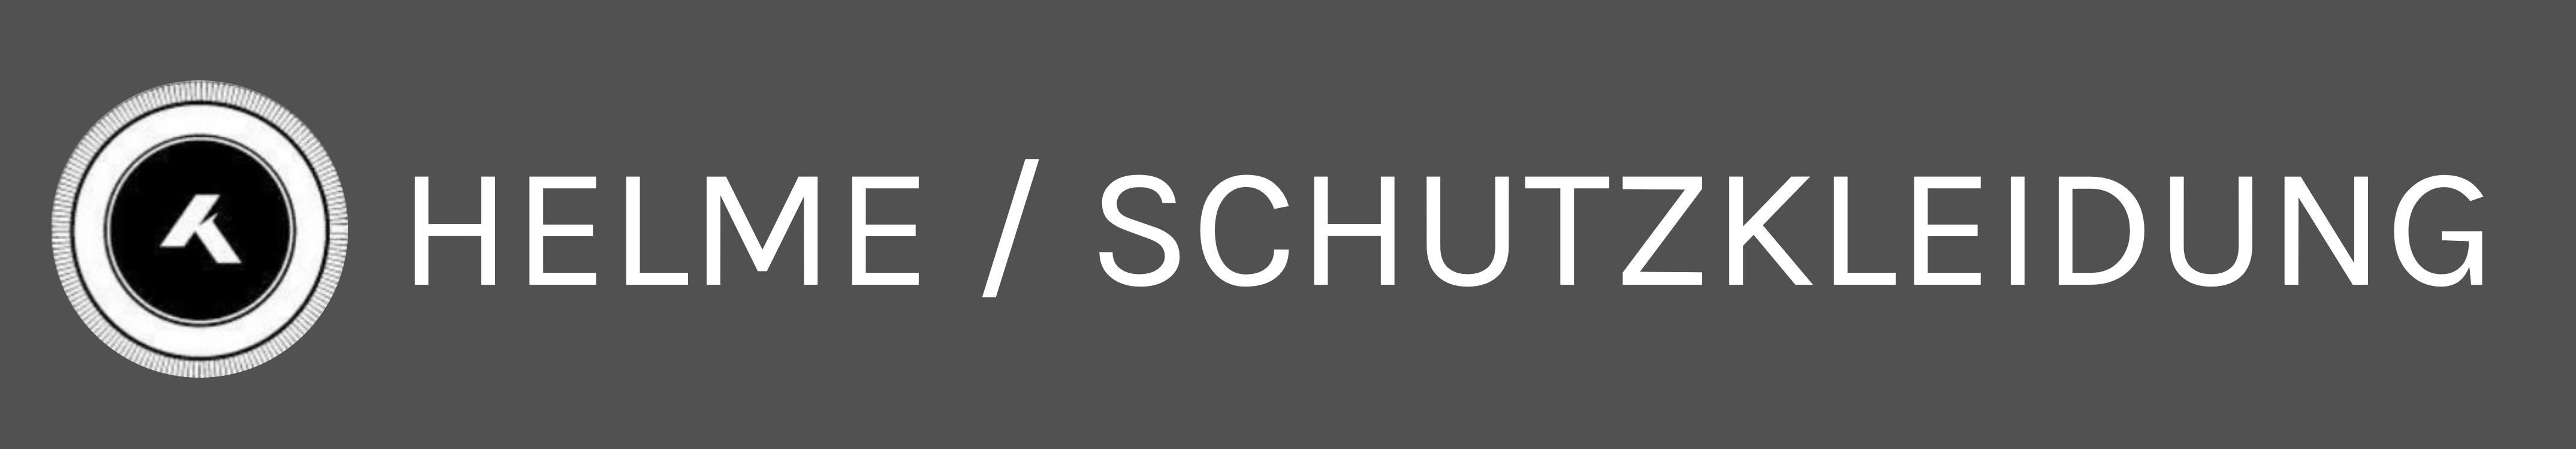 KHE-Banner-Helme-Schutzkleidung